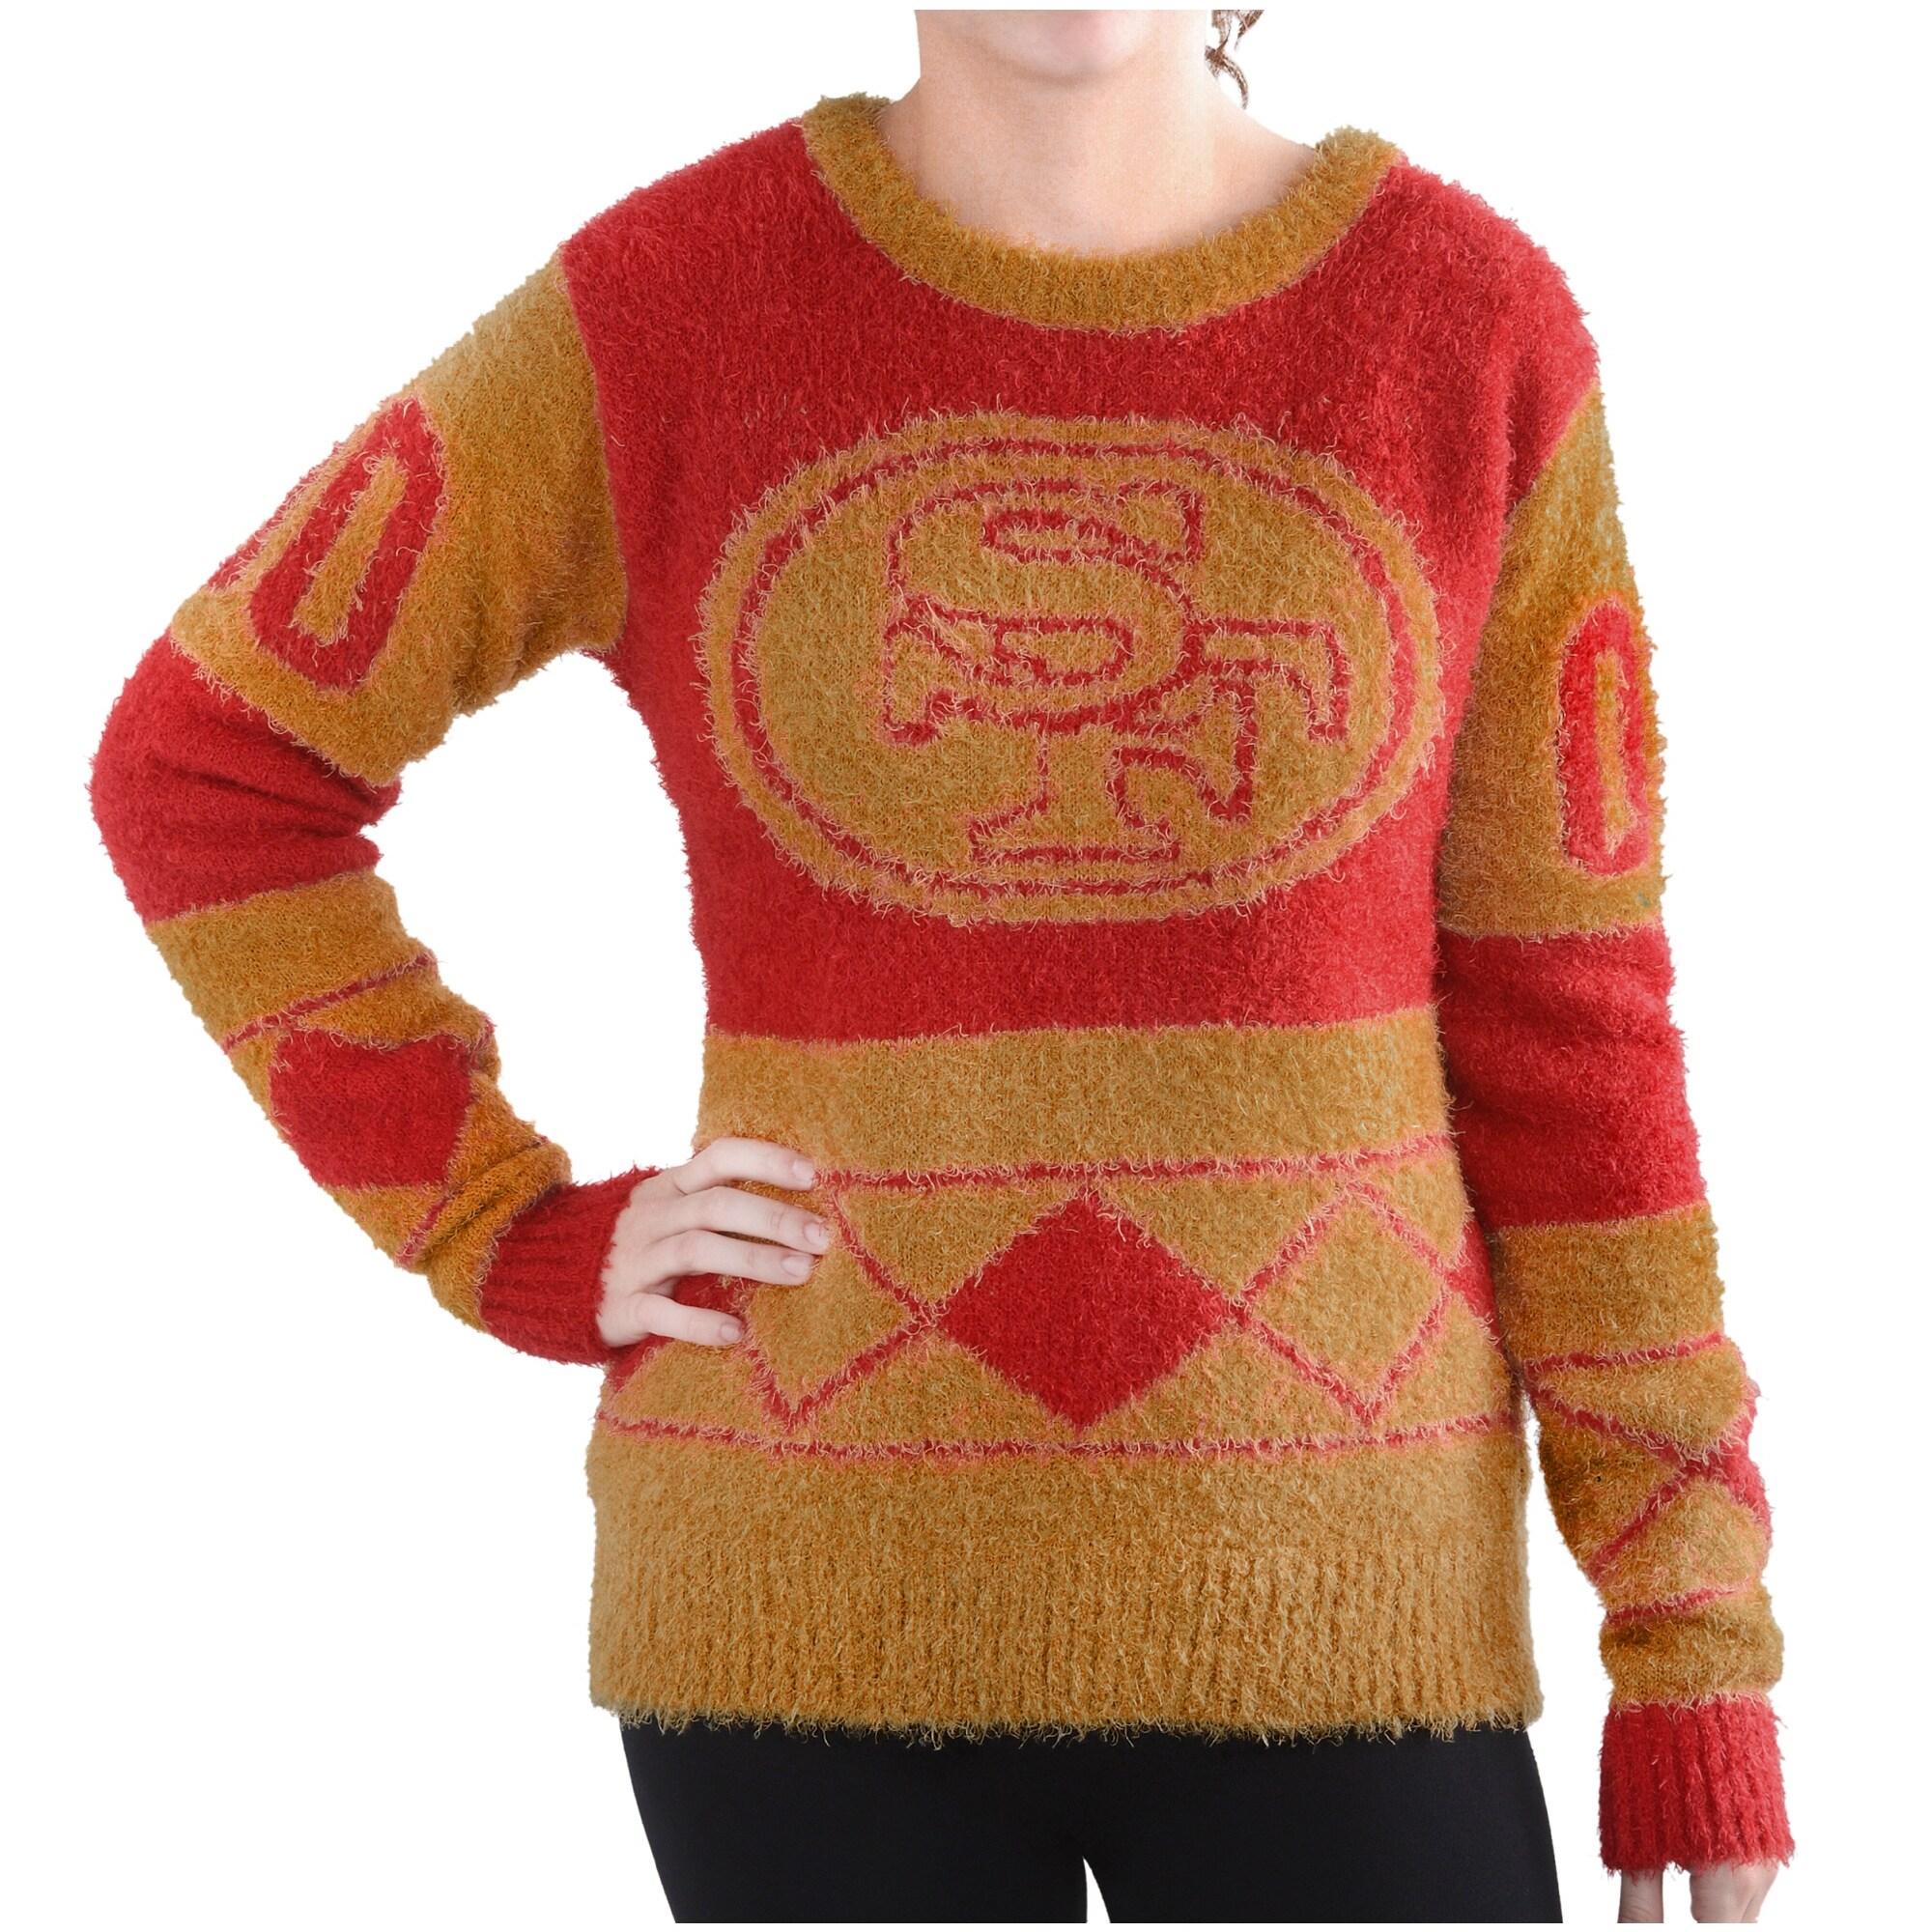 San Francisco 49ers Klew Women's Eyelash Crew Ugly Sweater - Scarlet